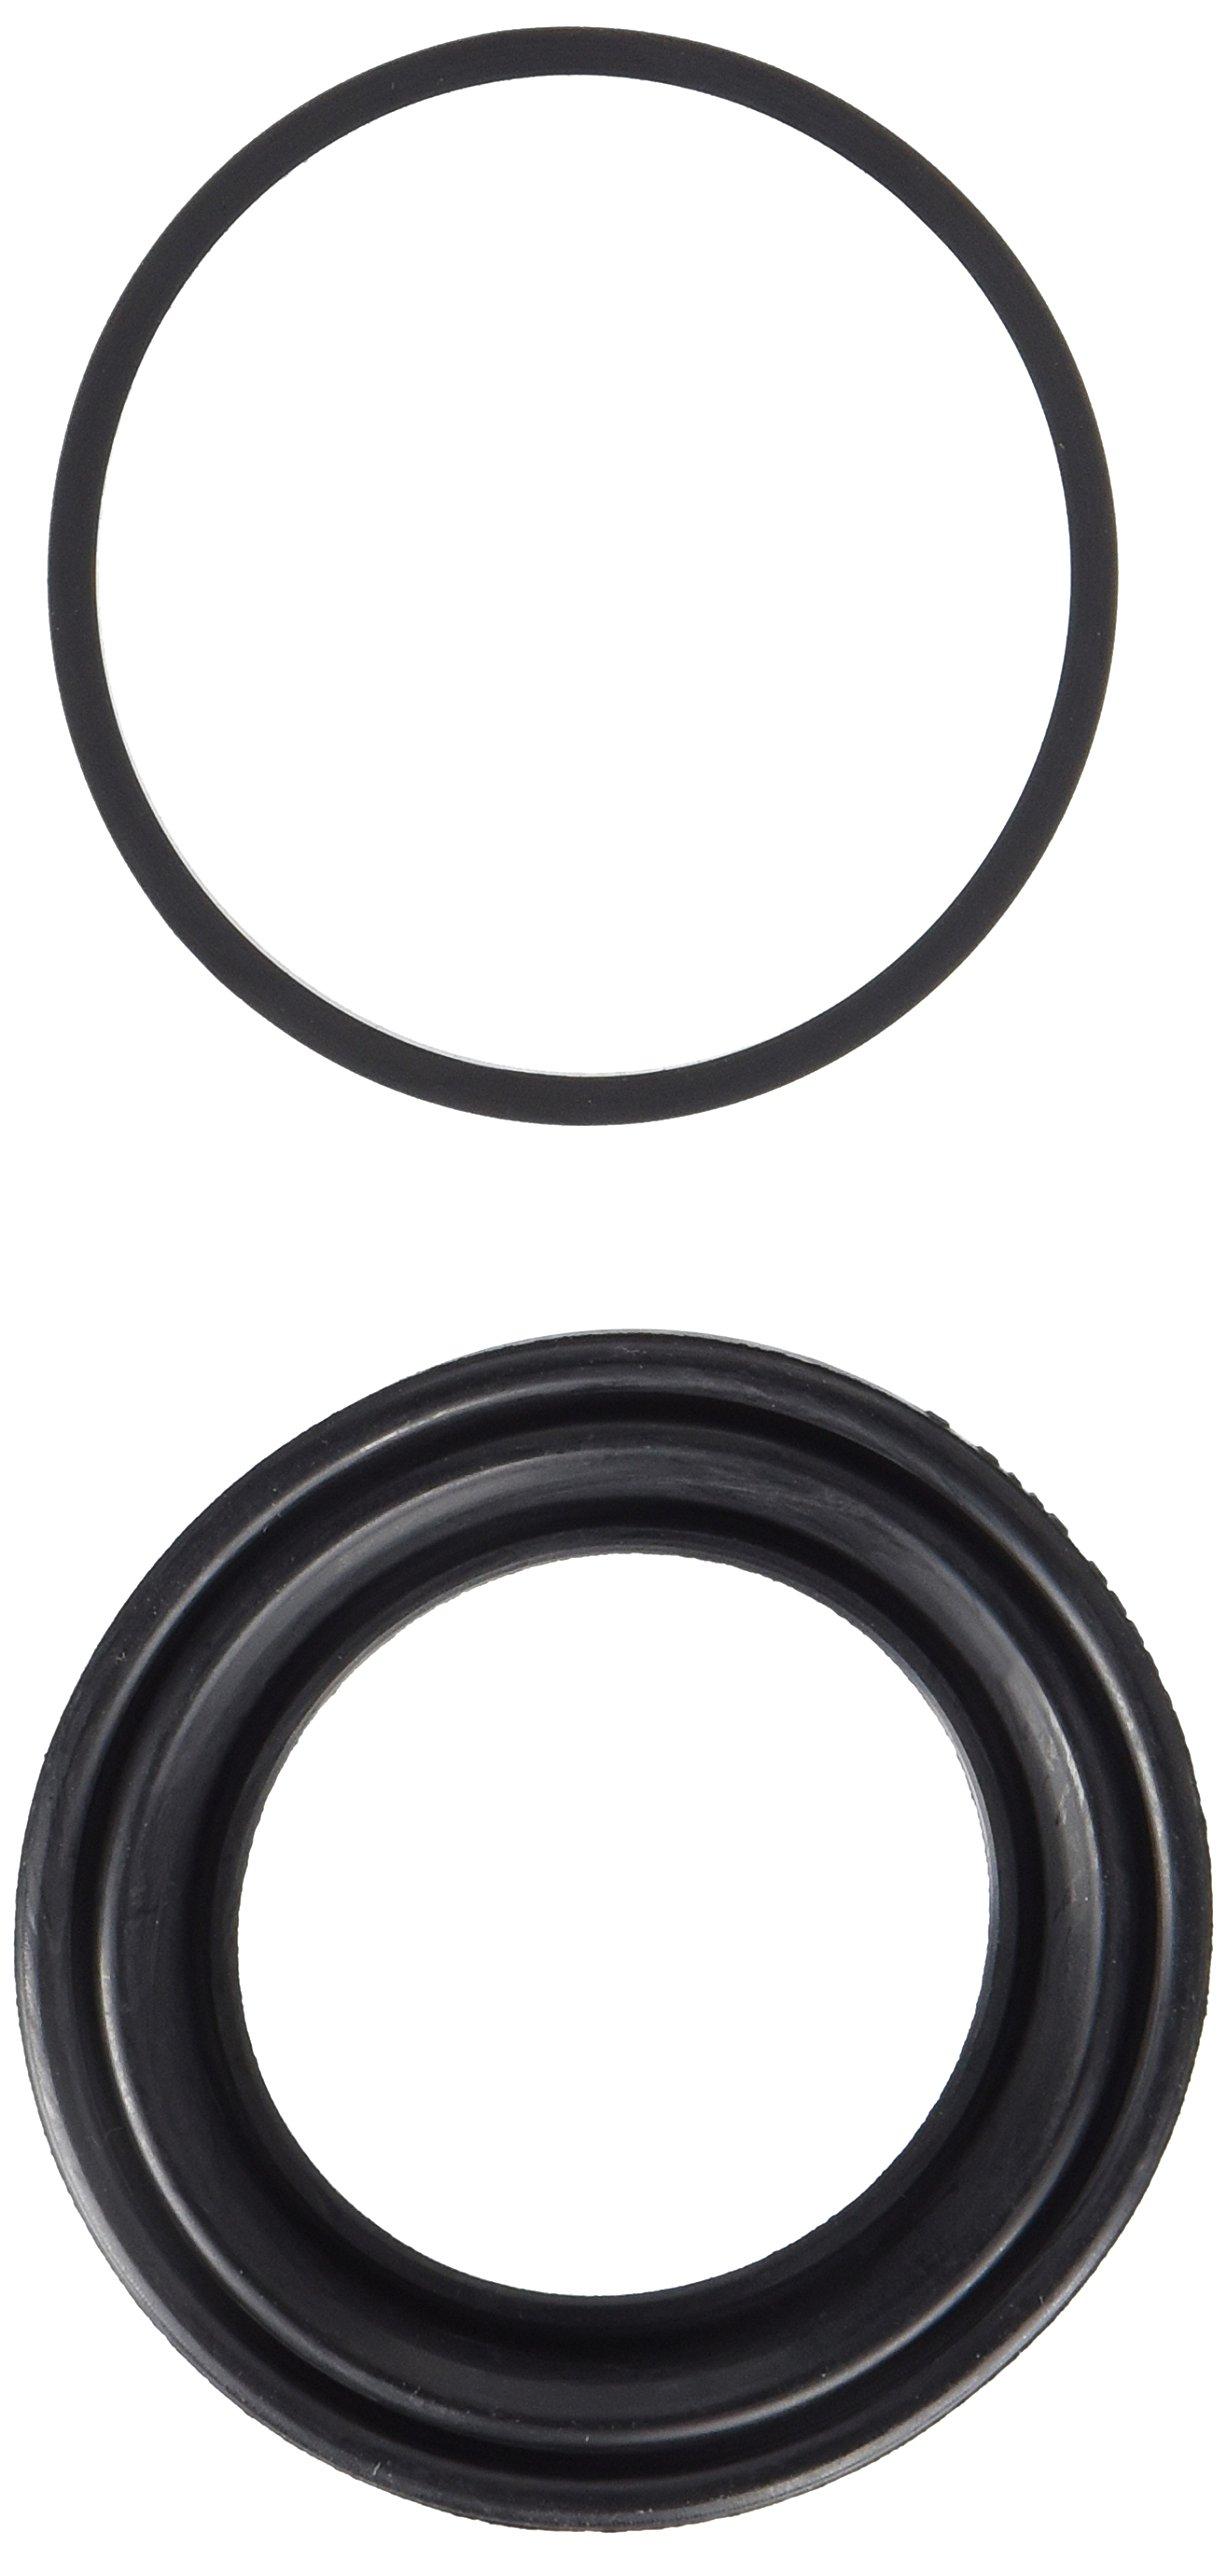 Centric Parts 143.91013 Caliper Kit